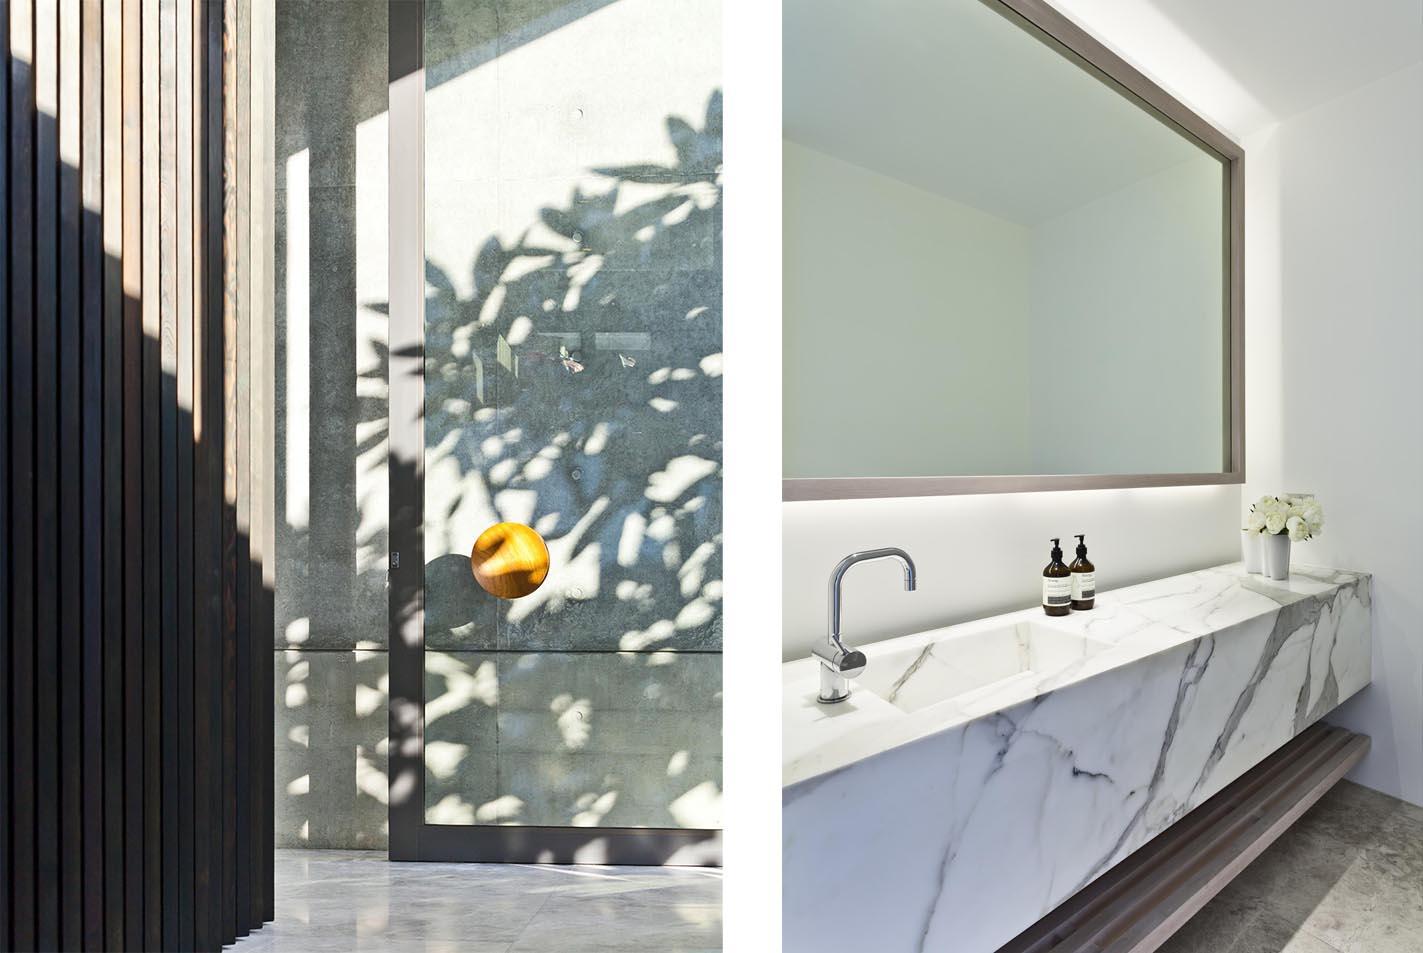 Gordon's Bay House - Local Bathroom Design - Madeleine Blanchfield Architects - Architecture Archive